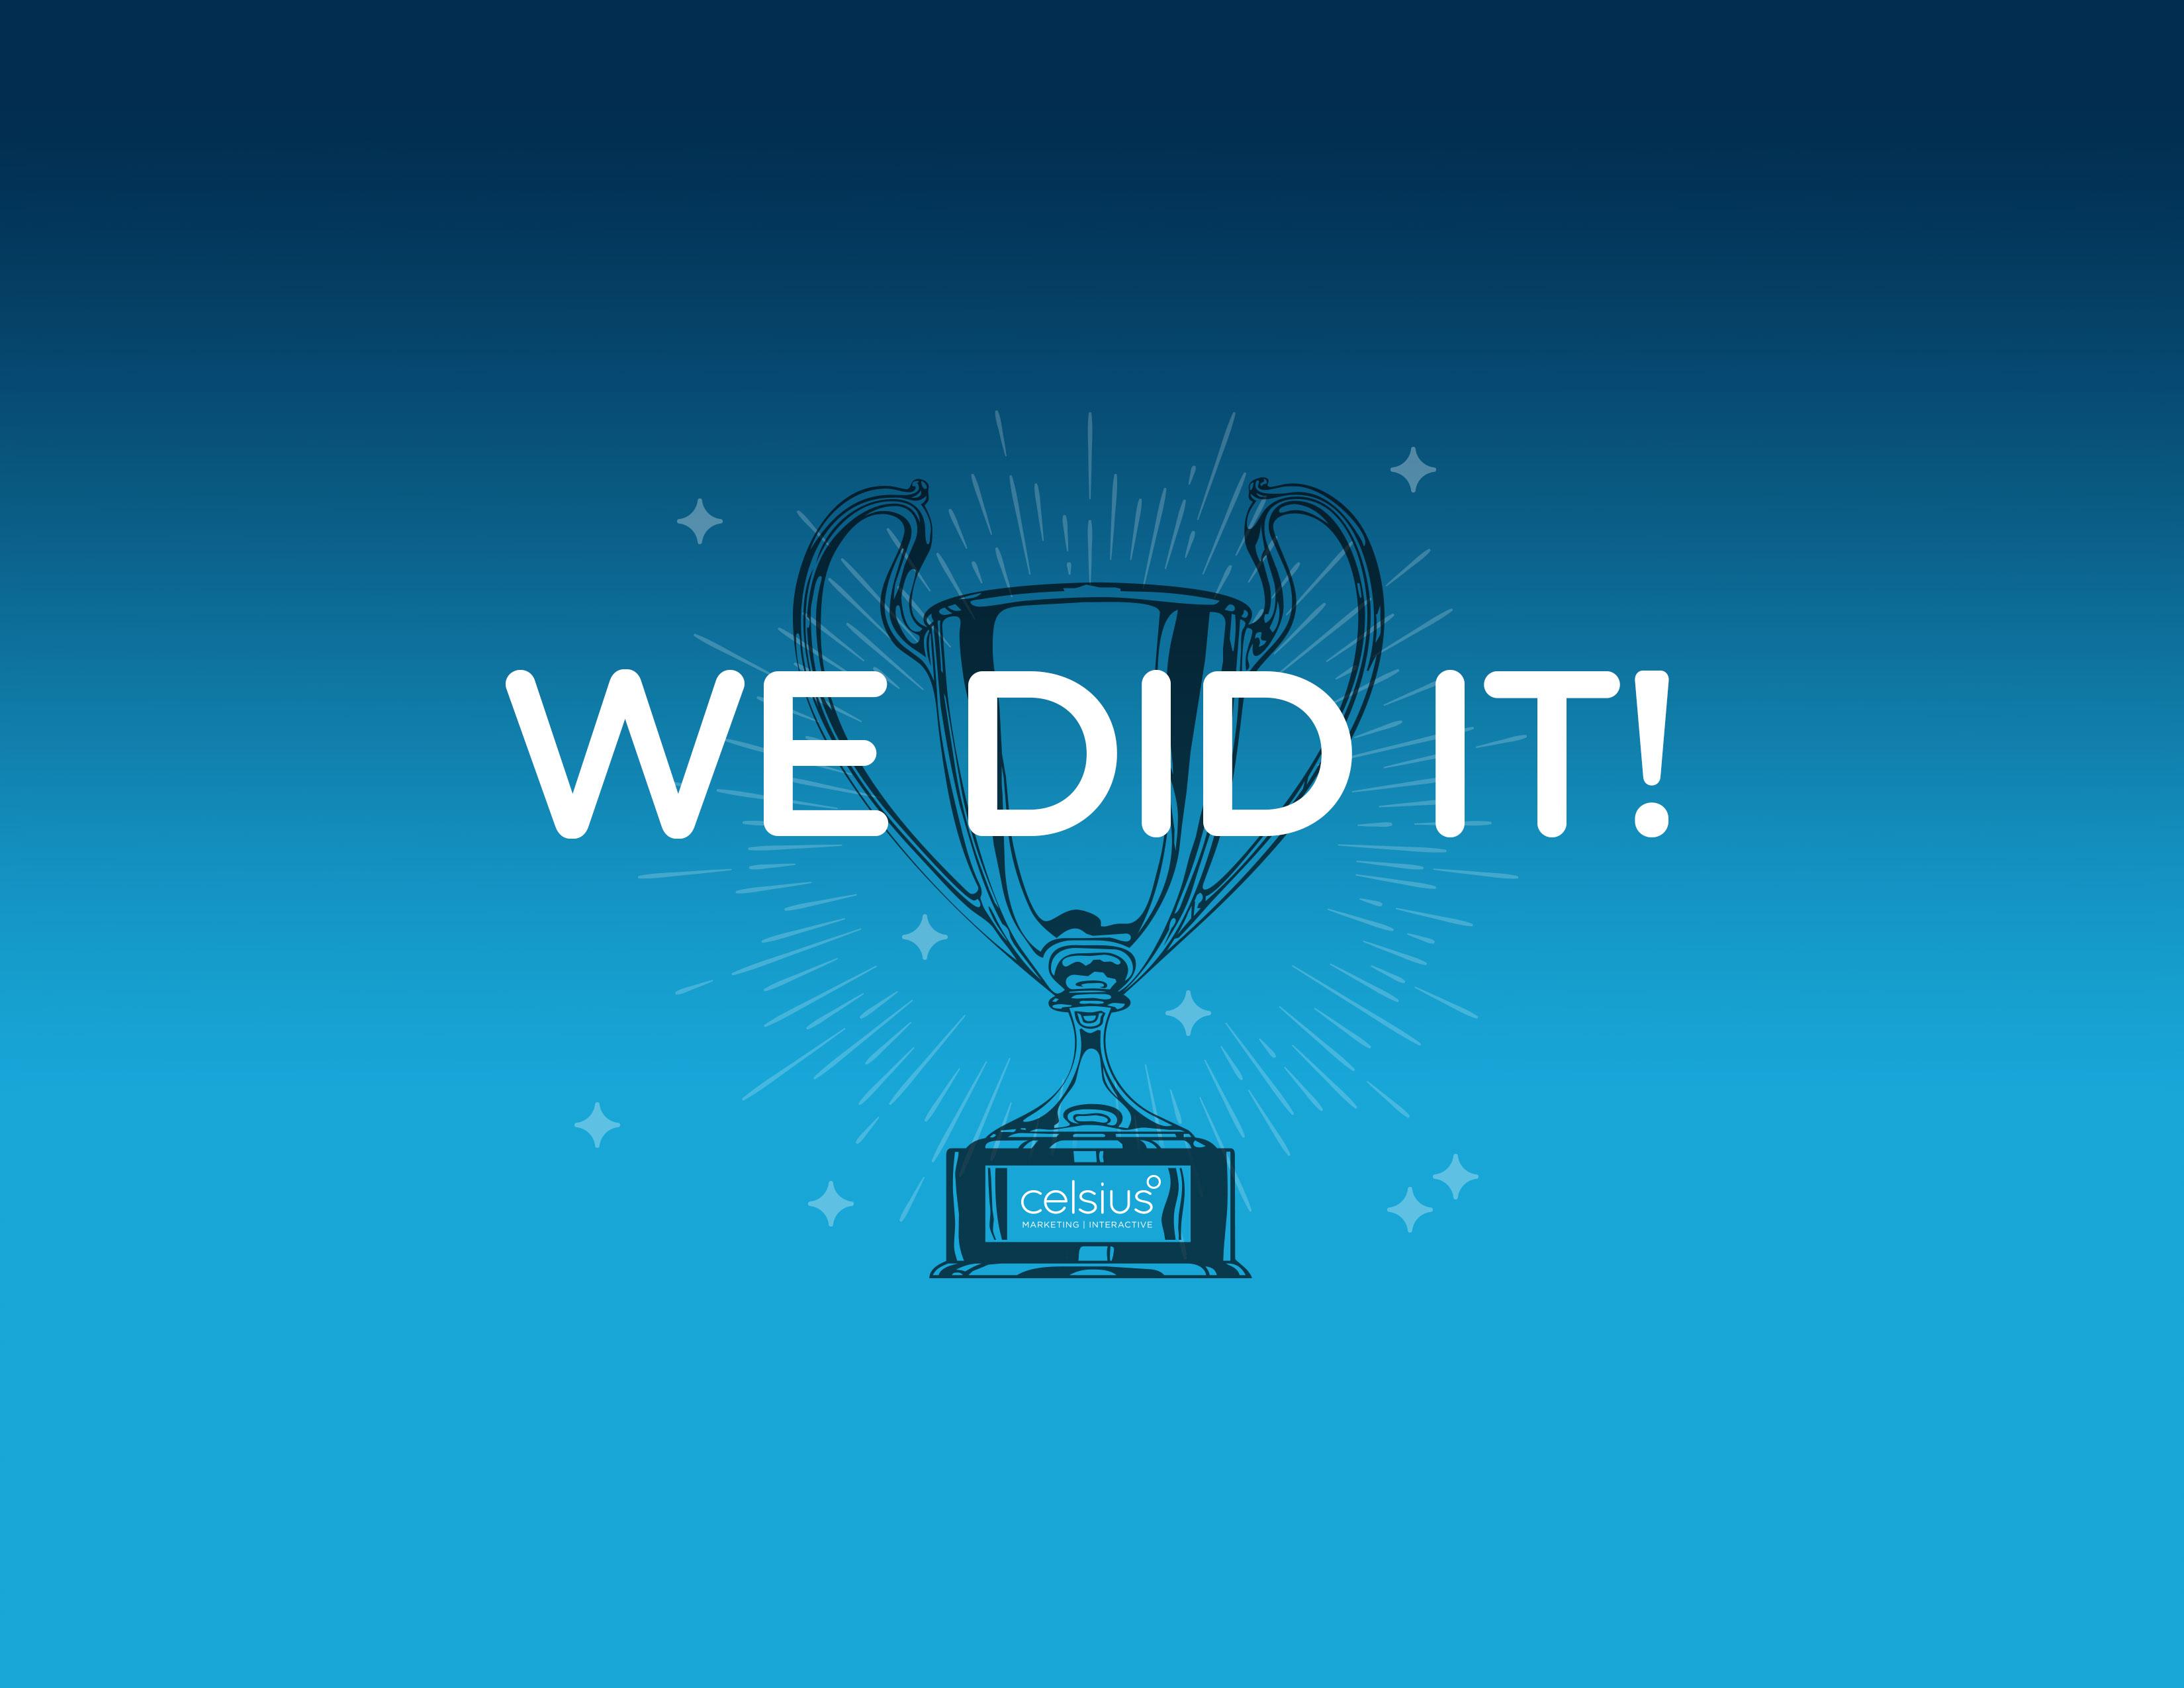 Celsius Wins Big at 2016 EduAd Awards